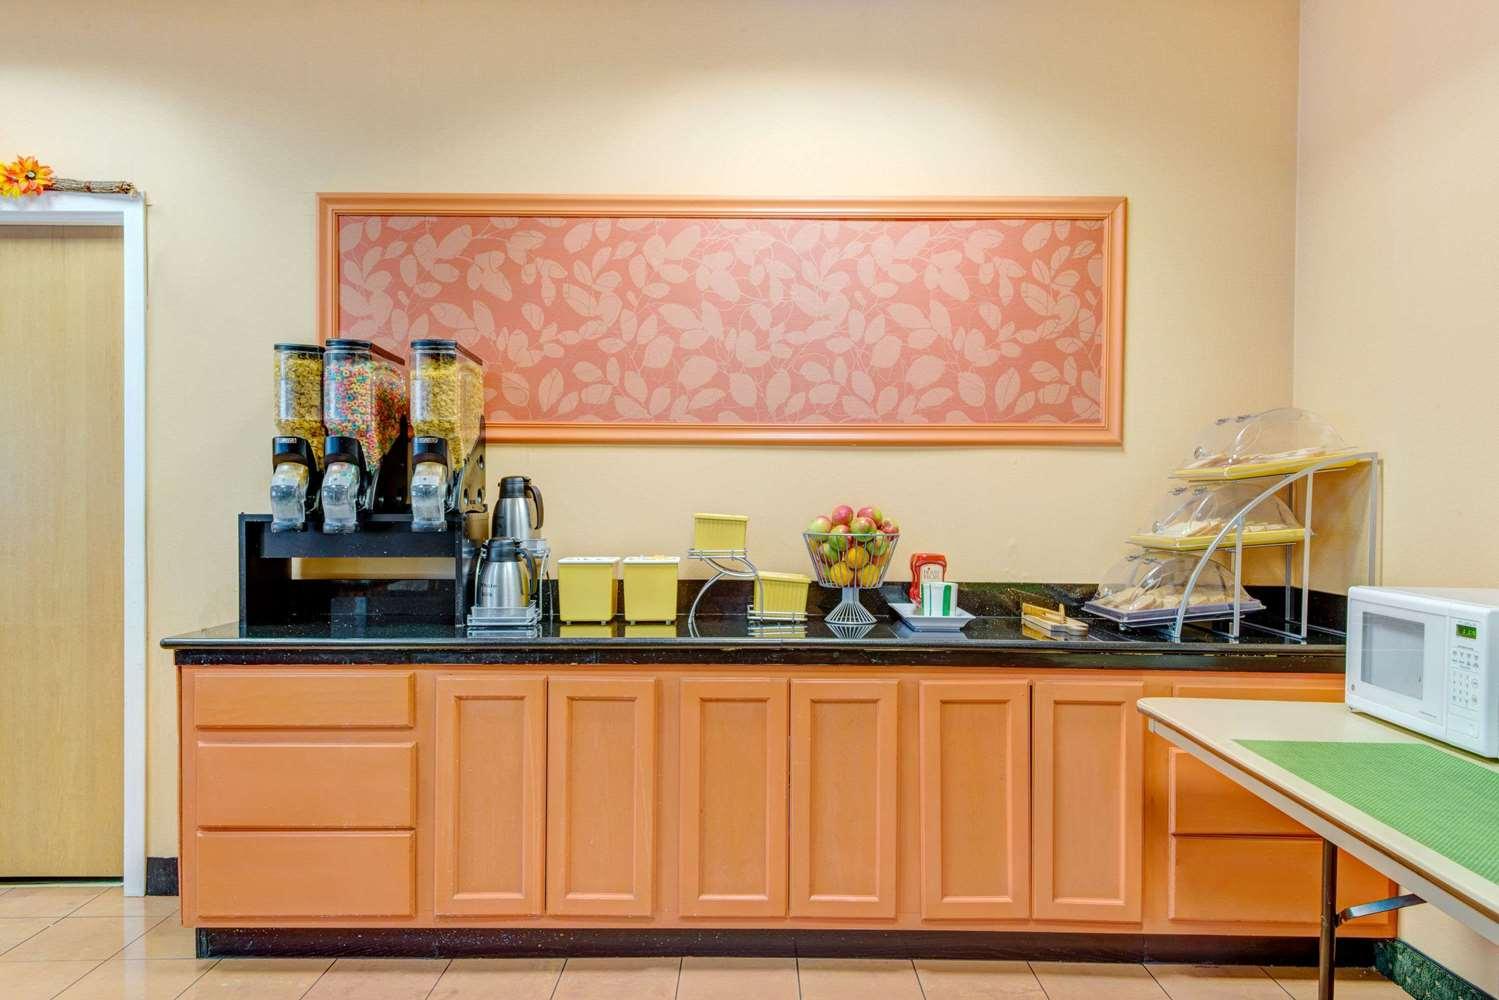 proam - Days Hotel & Conference Centre Methuen